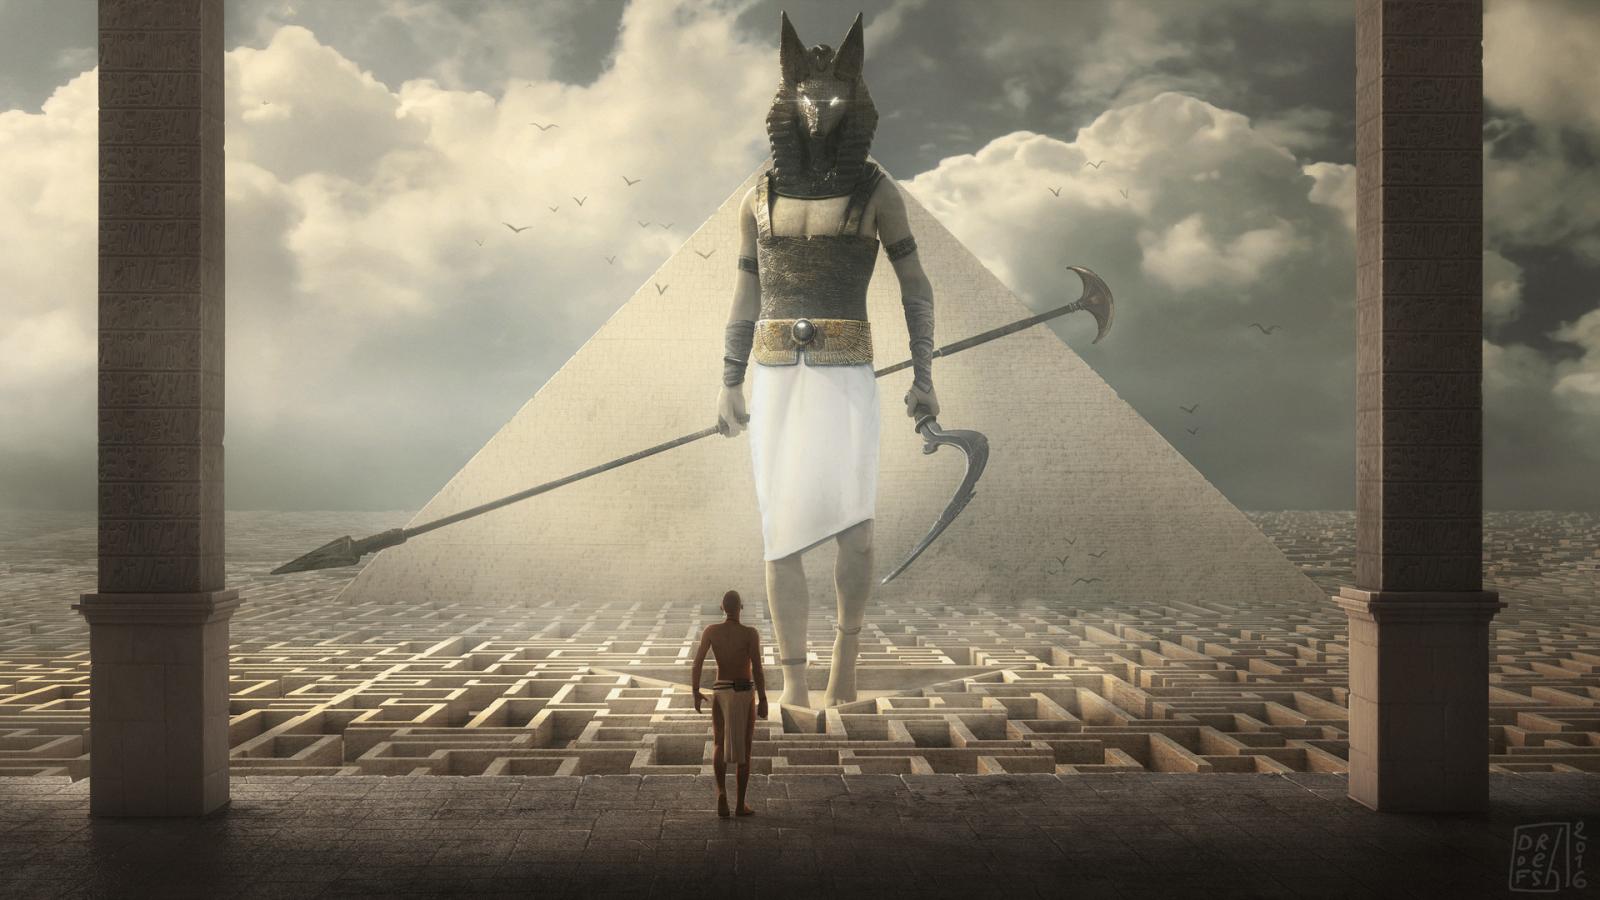 1600x900 Egypt Warrior Illustration Anubis Pyramid Fantasy